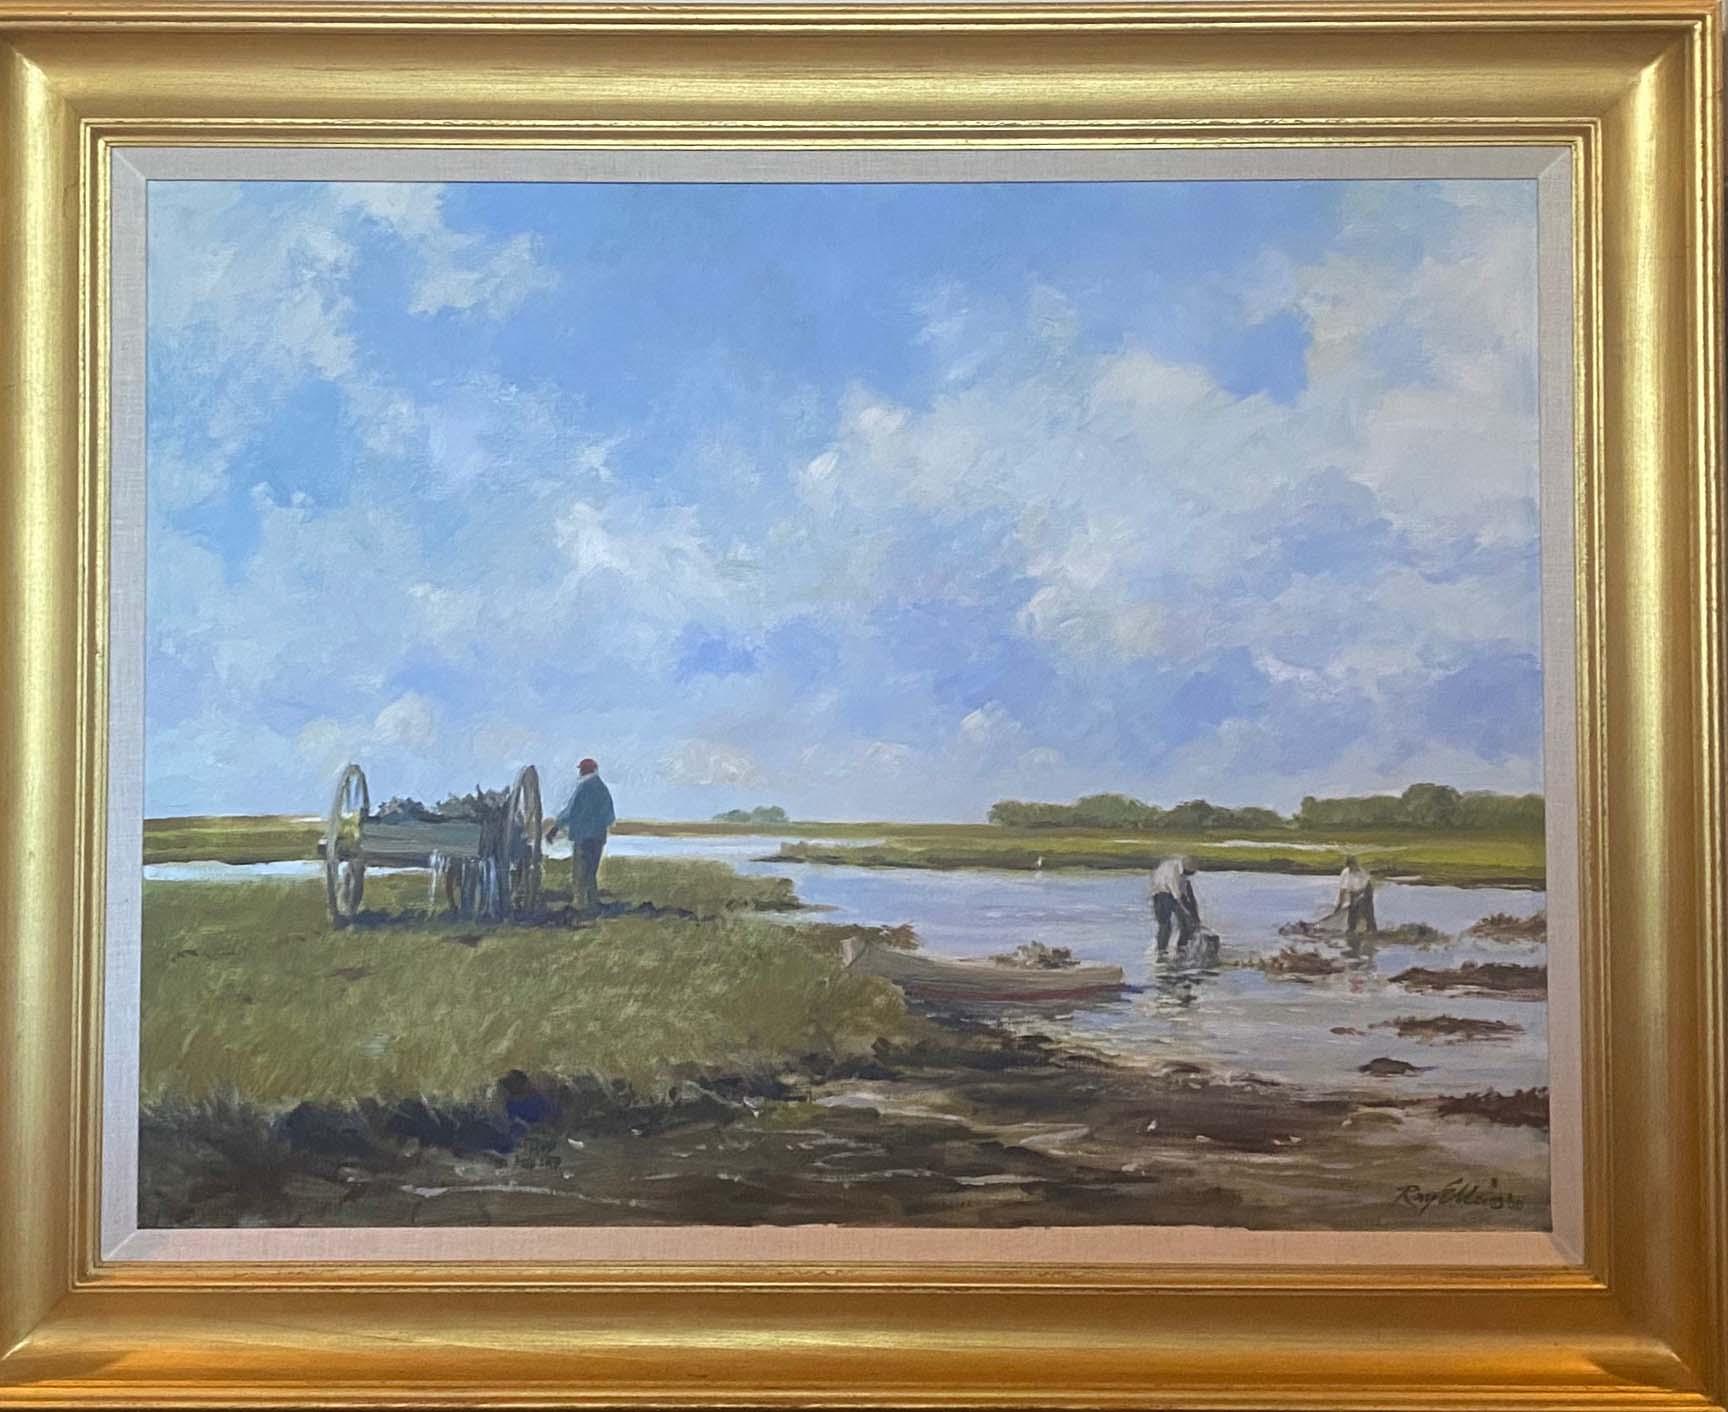 Oystering-framed